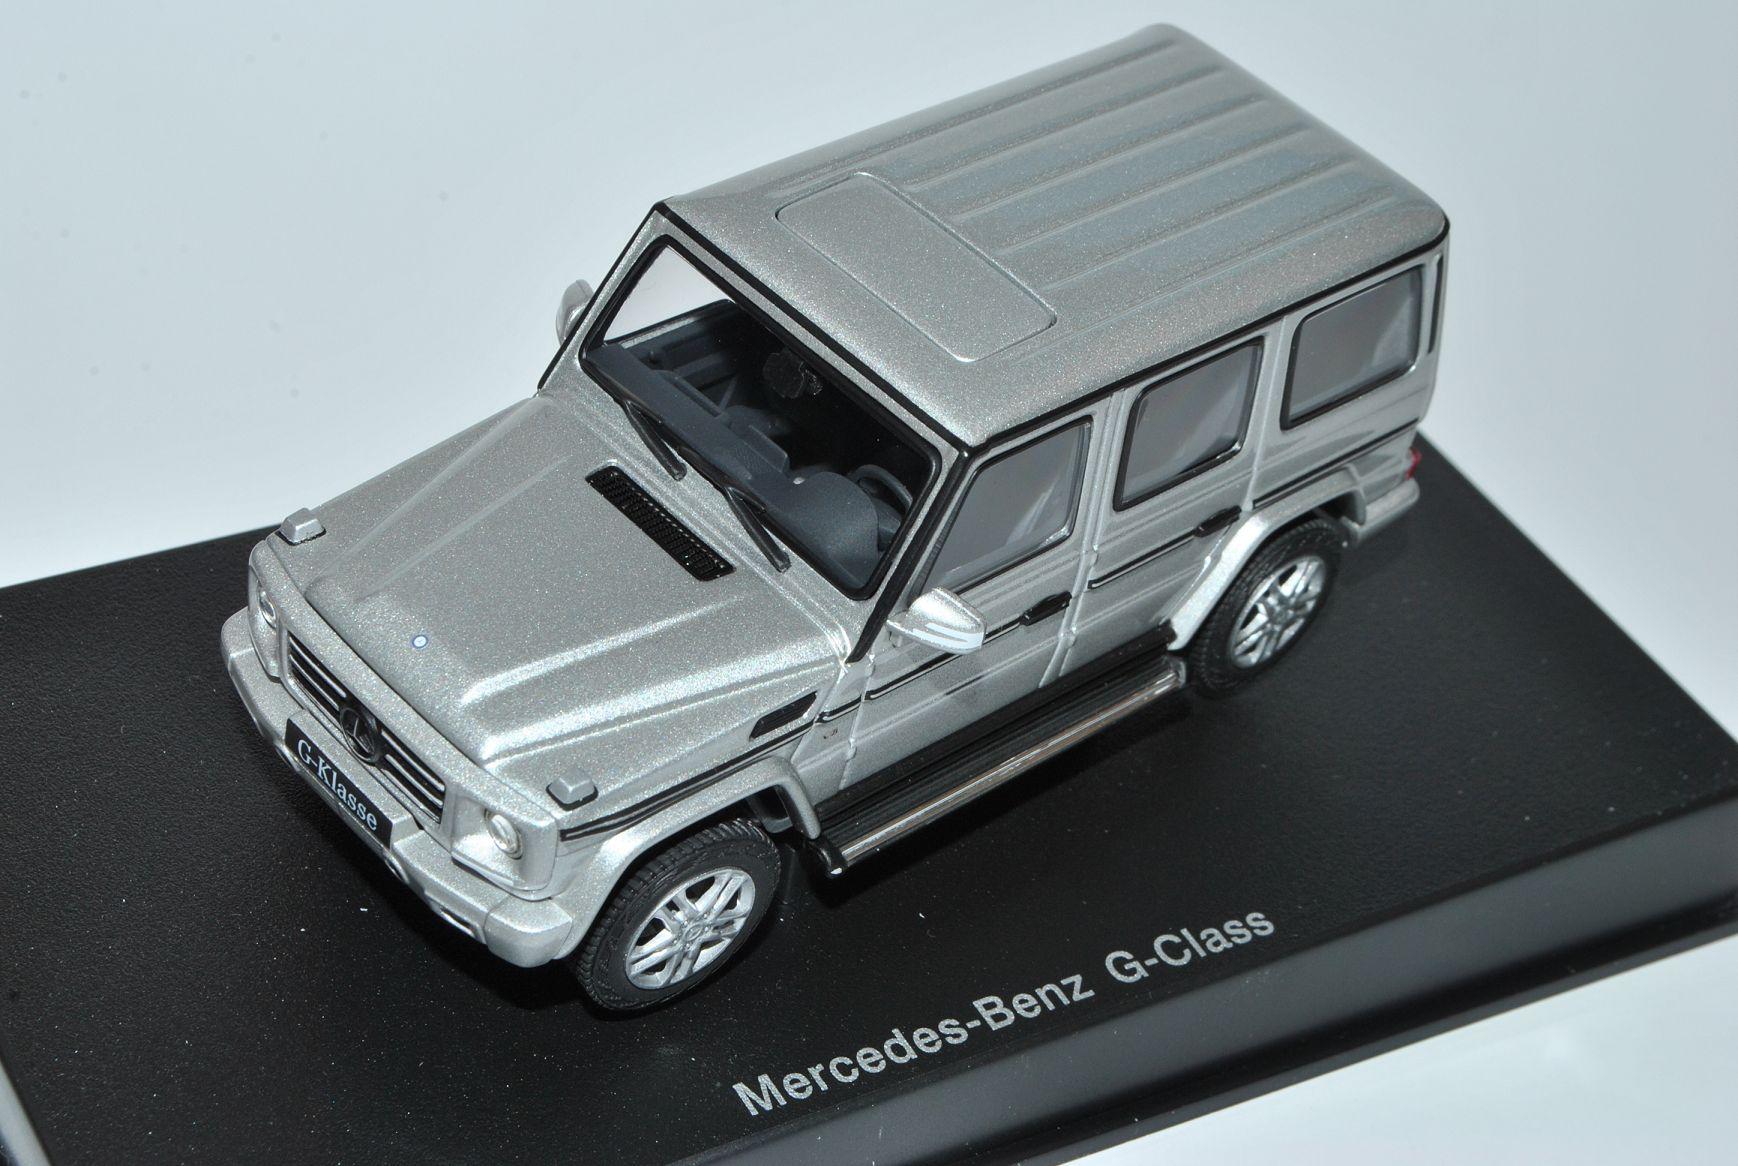 Mercedes-benz G-clase plata 5 puertas Facelift a partir de 2012 2012 2012 w463 56119 1 43 Autoart... b097c3